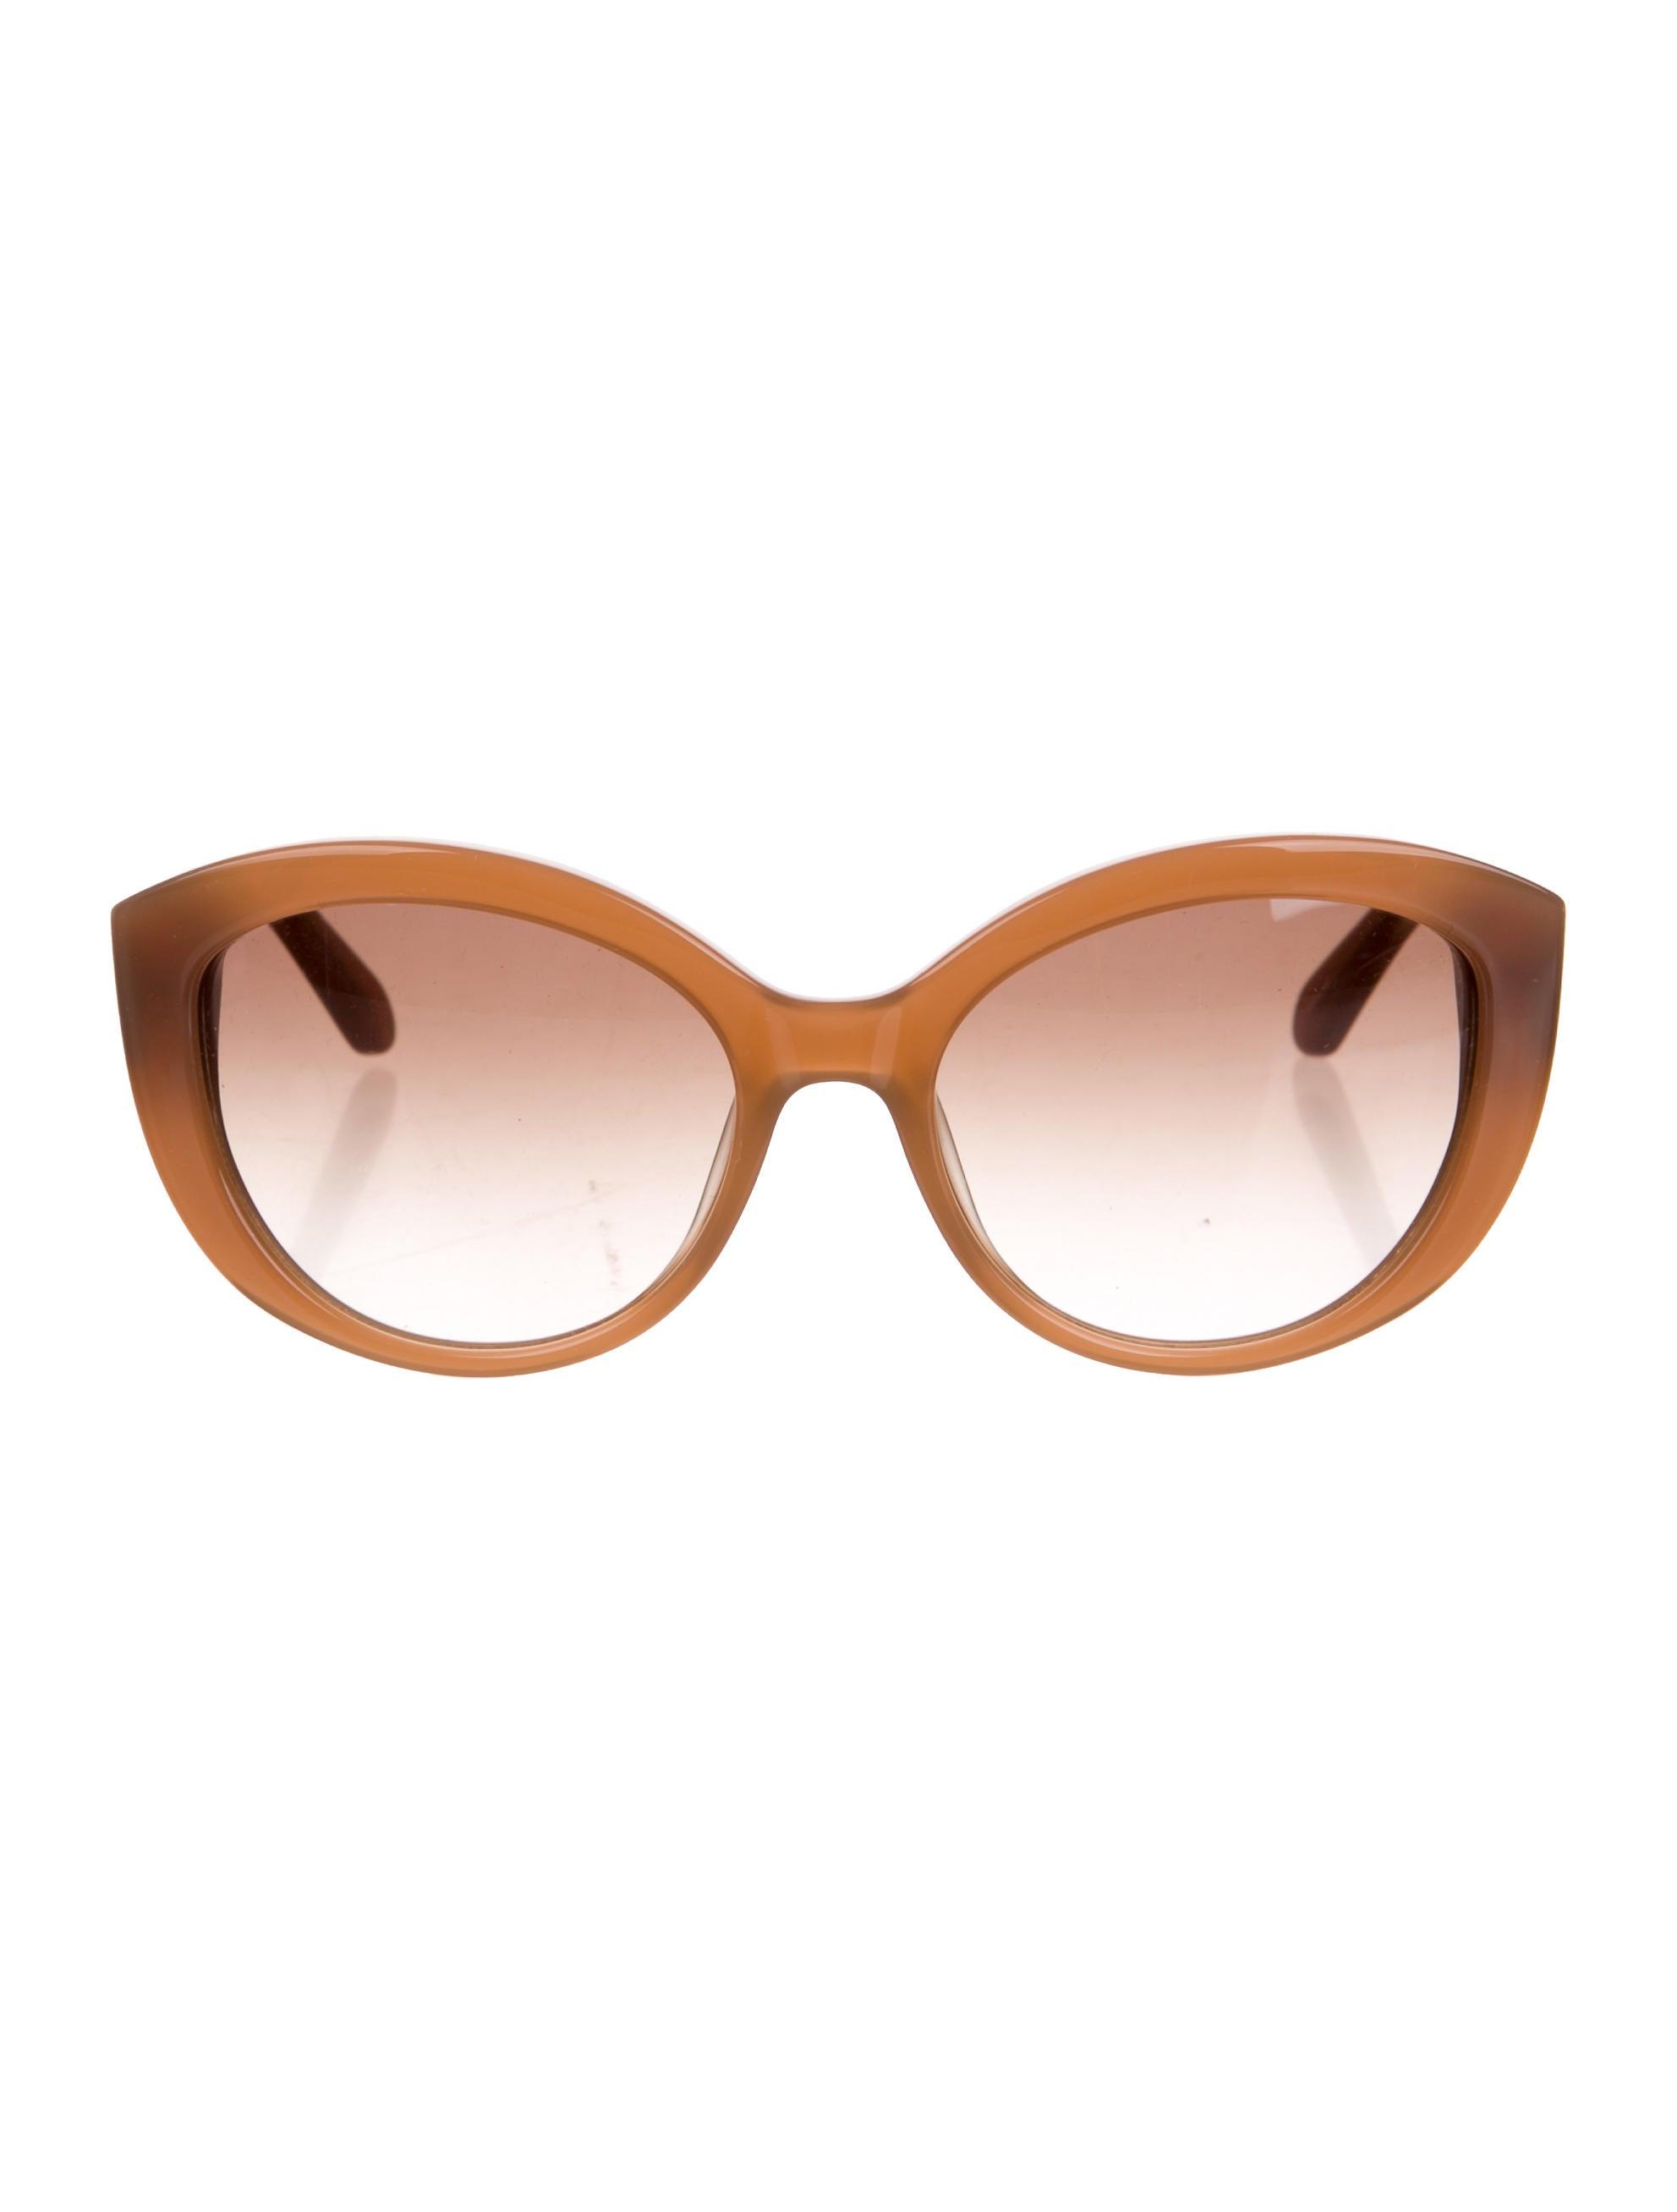 b11d8fdd93ae Kate Spade New York Sherrie Cat-Eye Sunglasses - Accessories ...